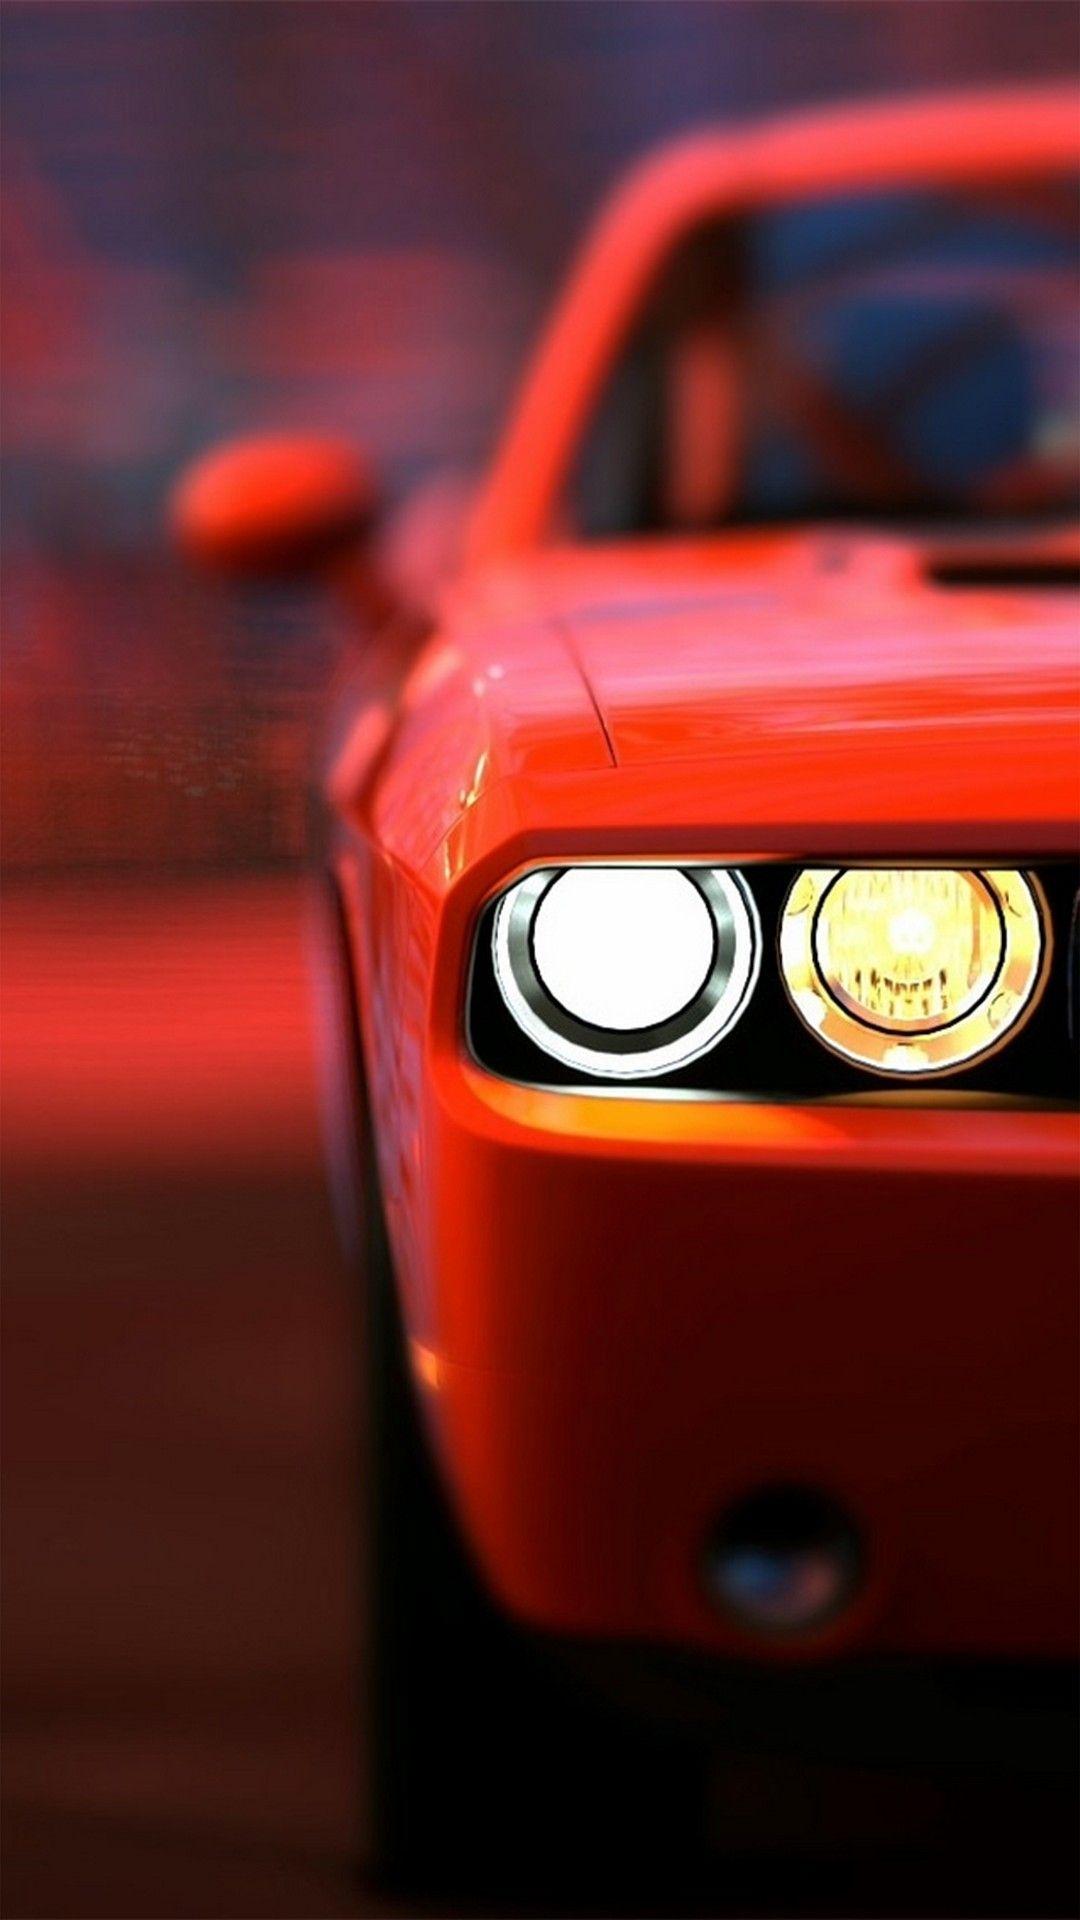 Images For Whatsapp Dodge Challenger Srt